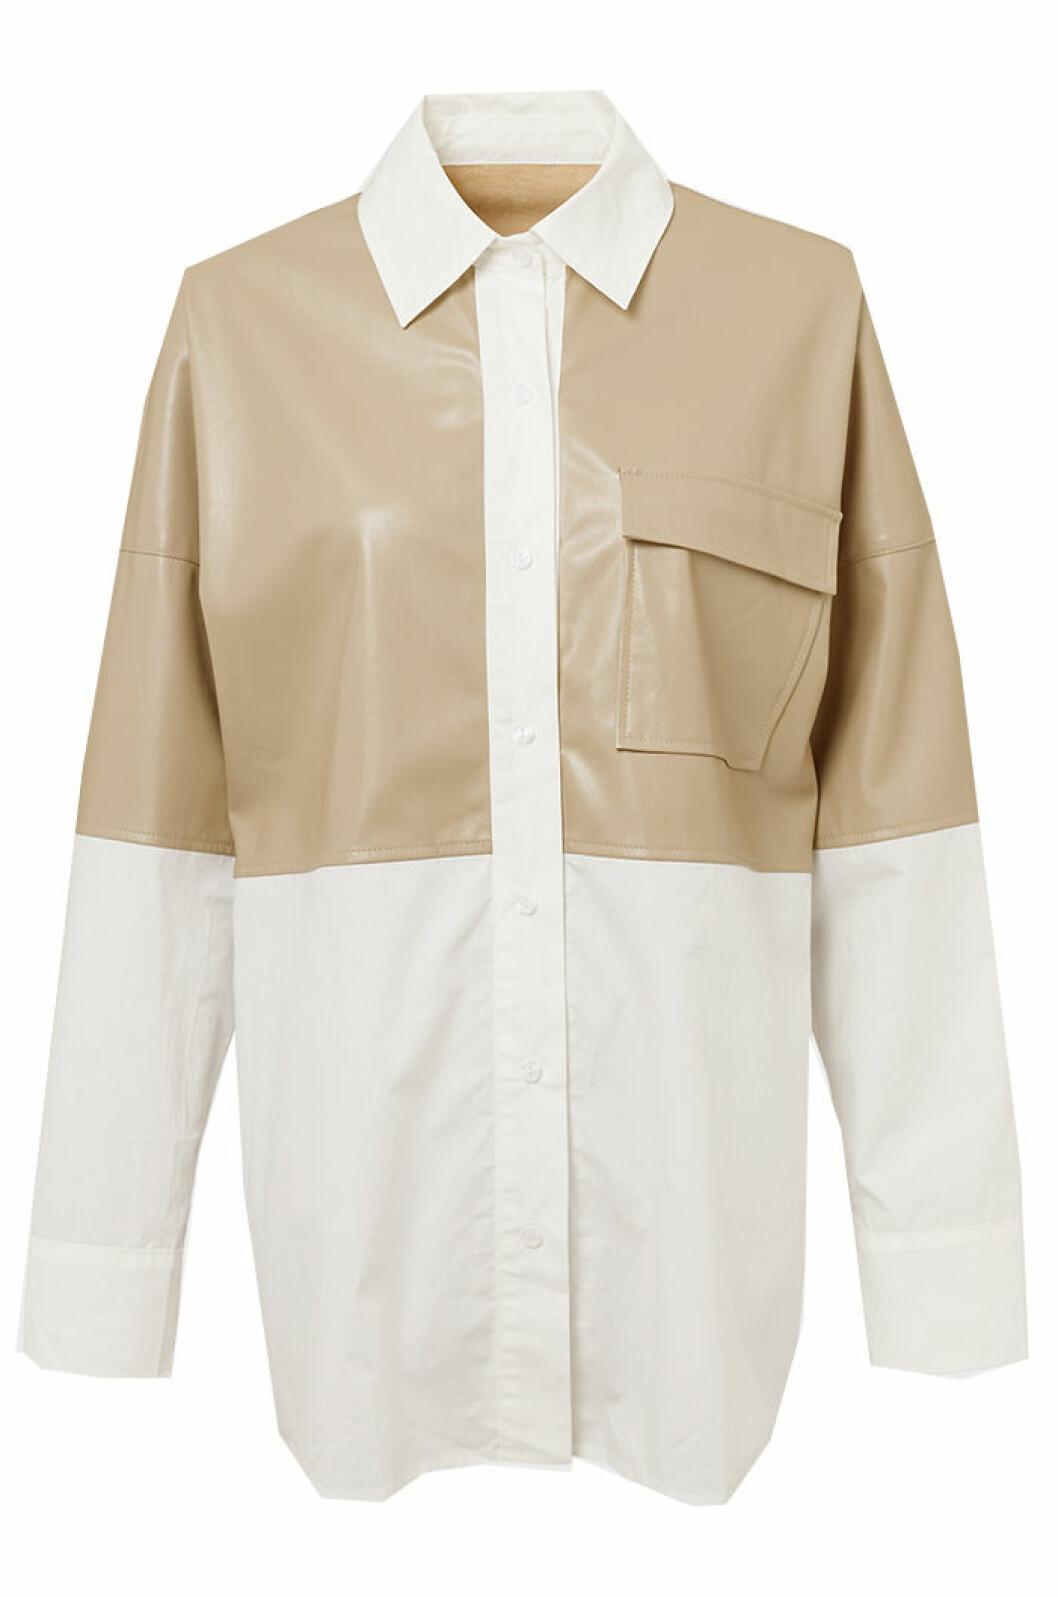 vit-beige-skjorta-biancaxnelly